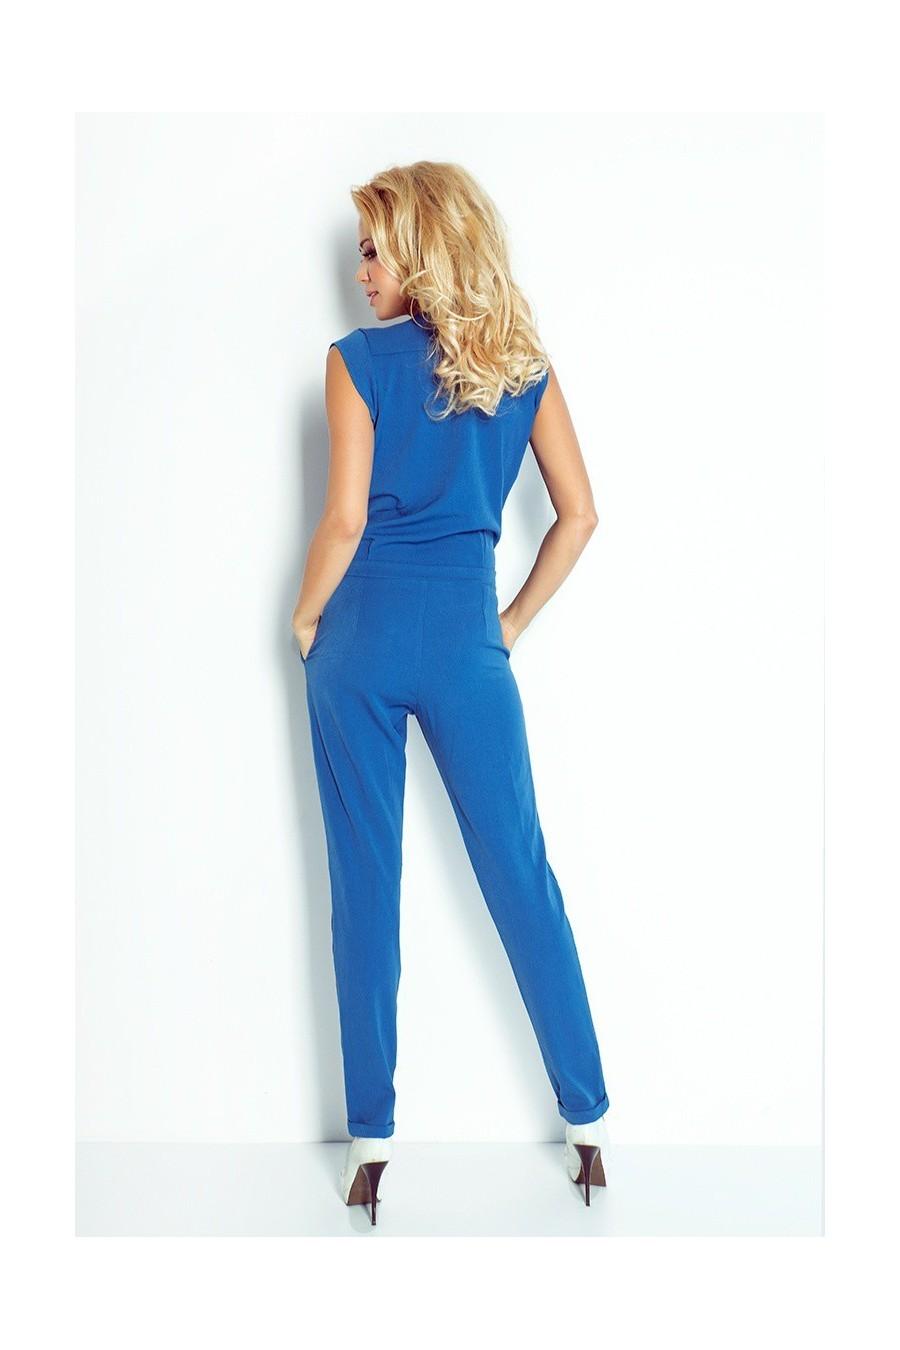 Oblek - modry  95-5